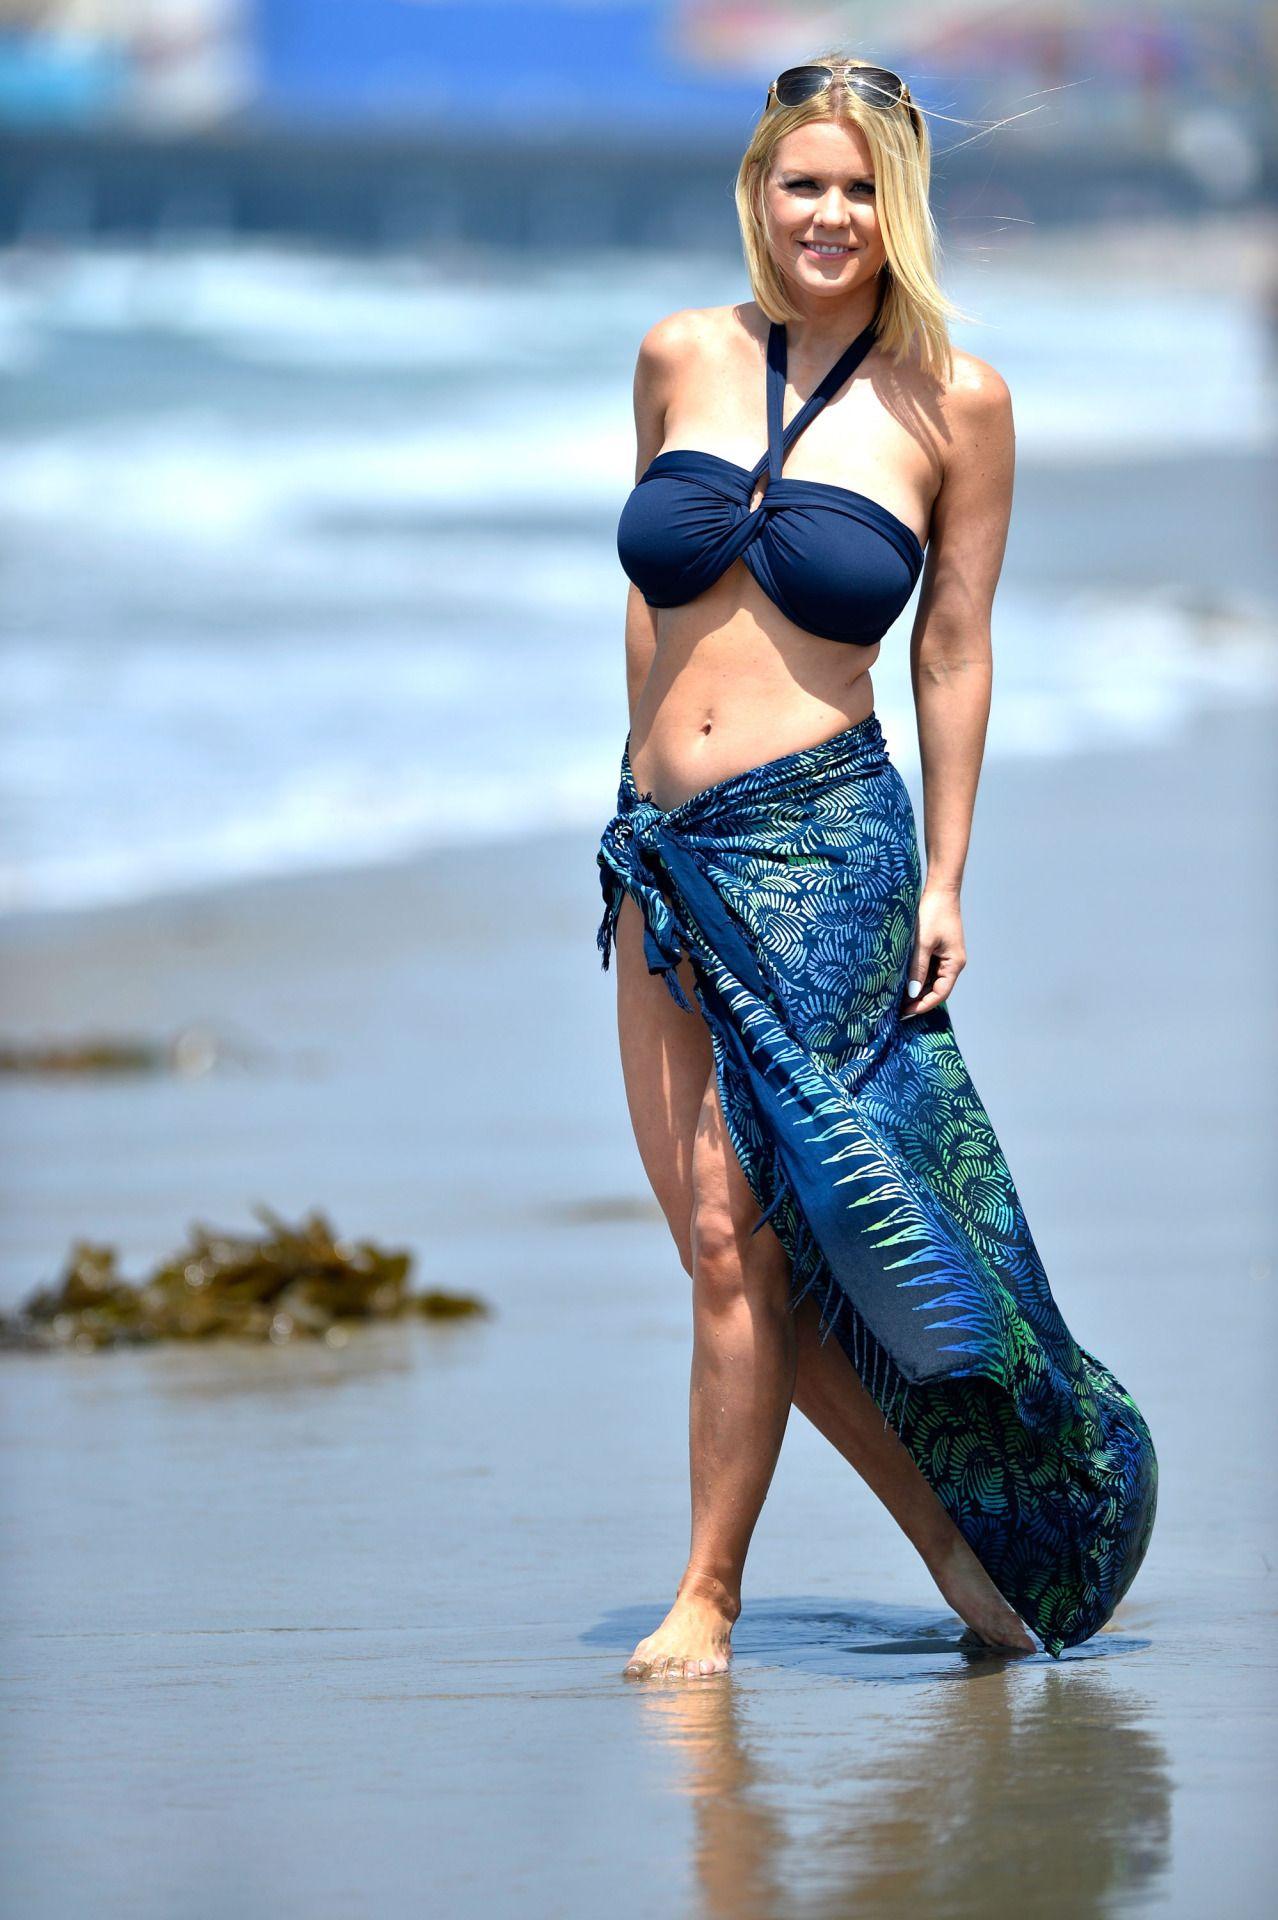 Bikini Carrie Keagan nude (65 photos), Ass, Paparazzi, Twitter, cleavage 2015